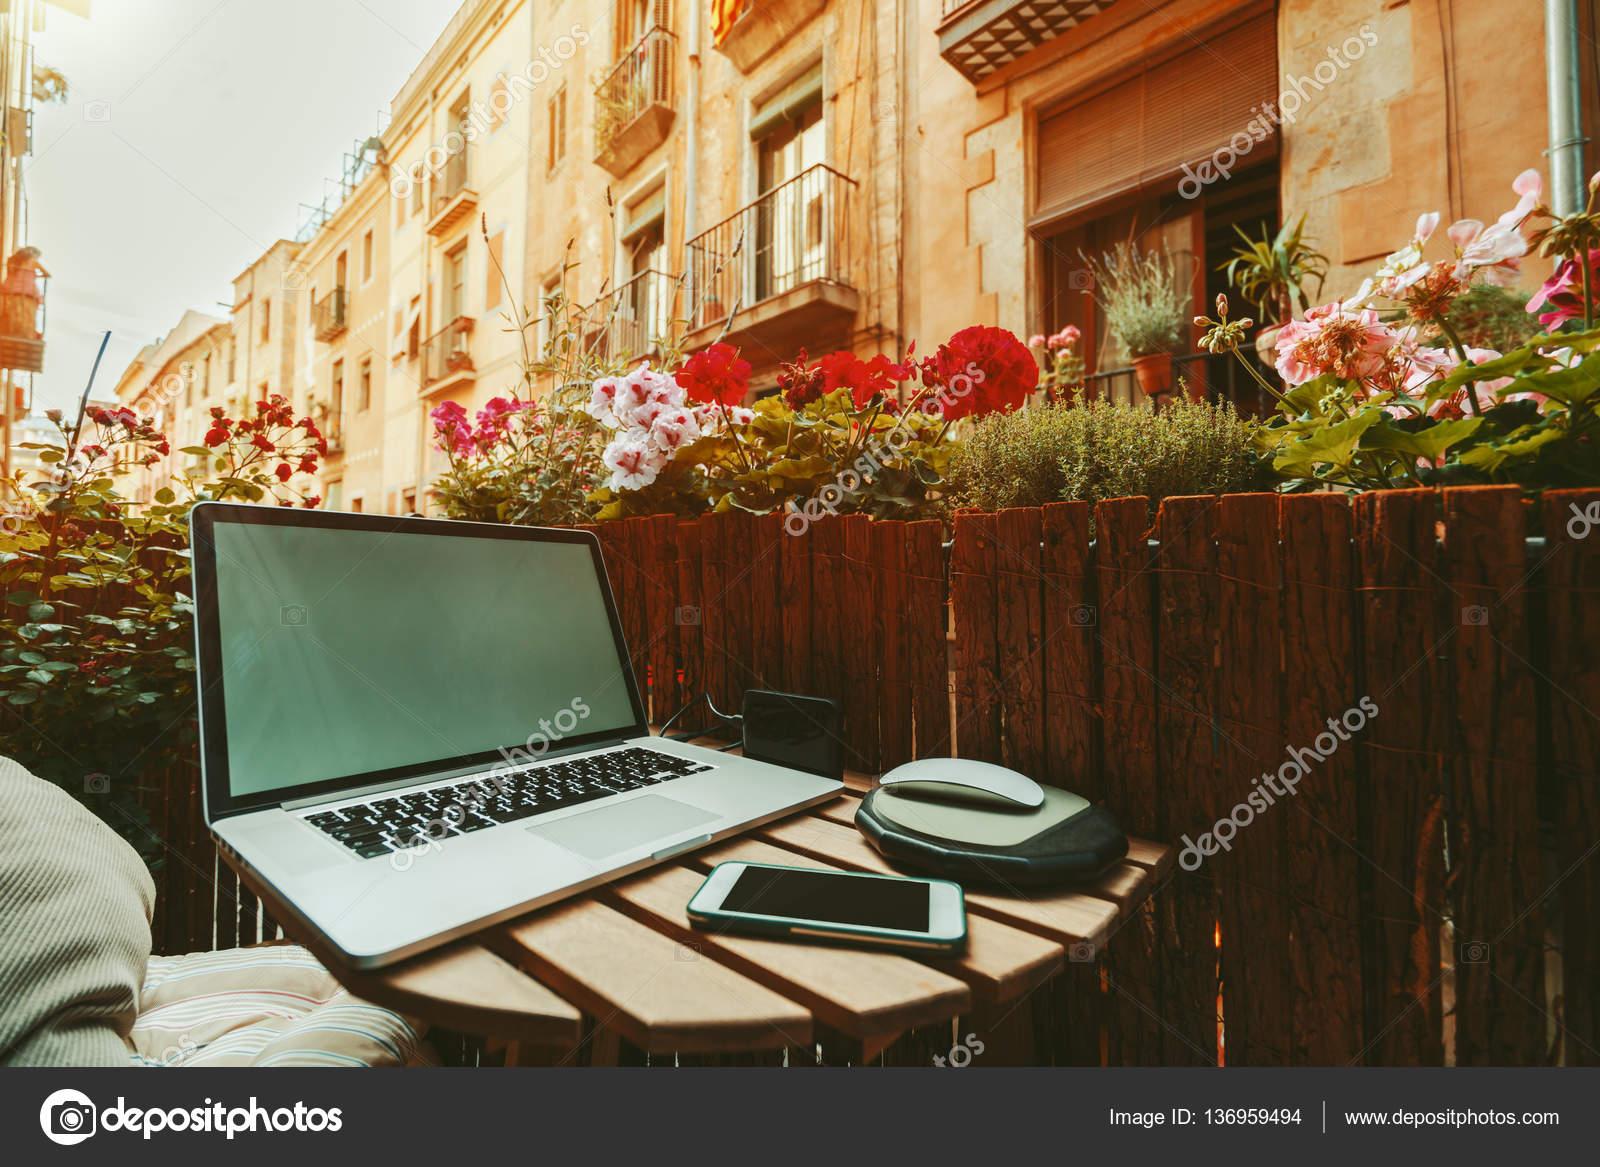 Gezellig Zonnig Balkon : Gezellige werkplek op balkon op zonnige dag u stockfoto